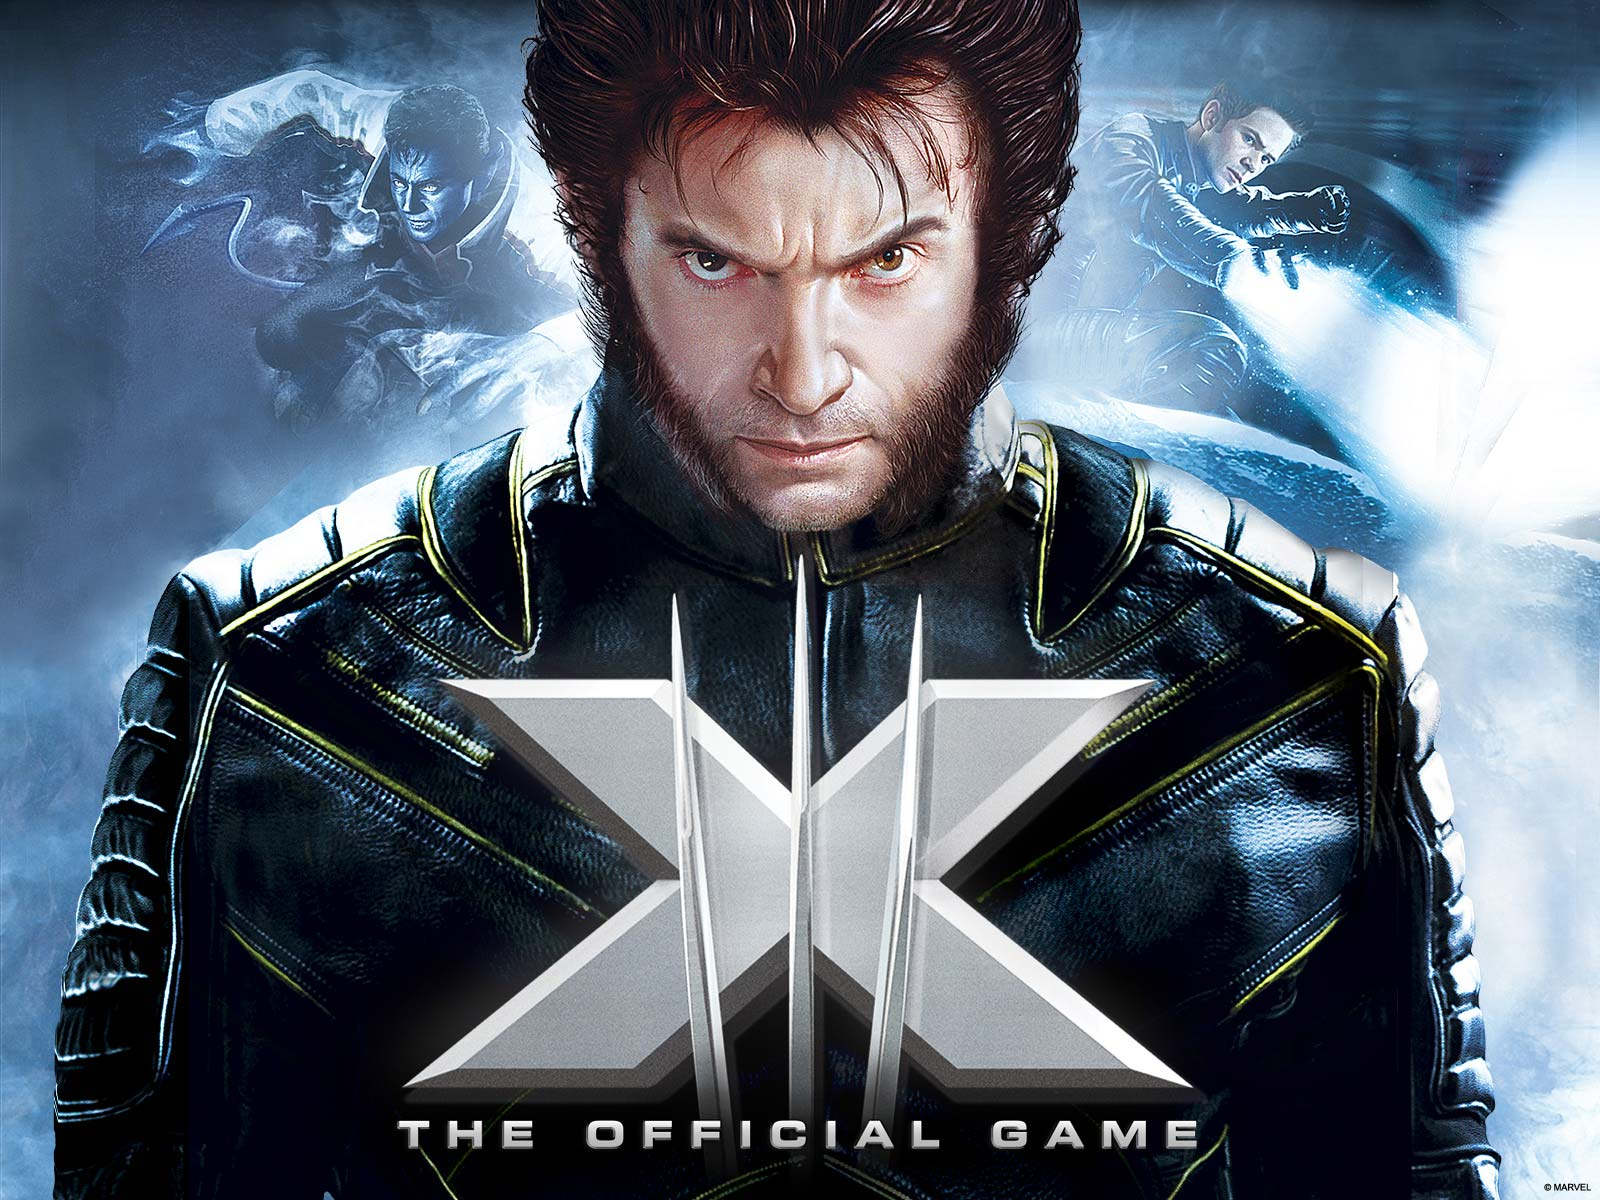 Hd wallpaper x man - Hugh Jackman X Men Wolverine Wallpapers Hd Collection The Smashable